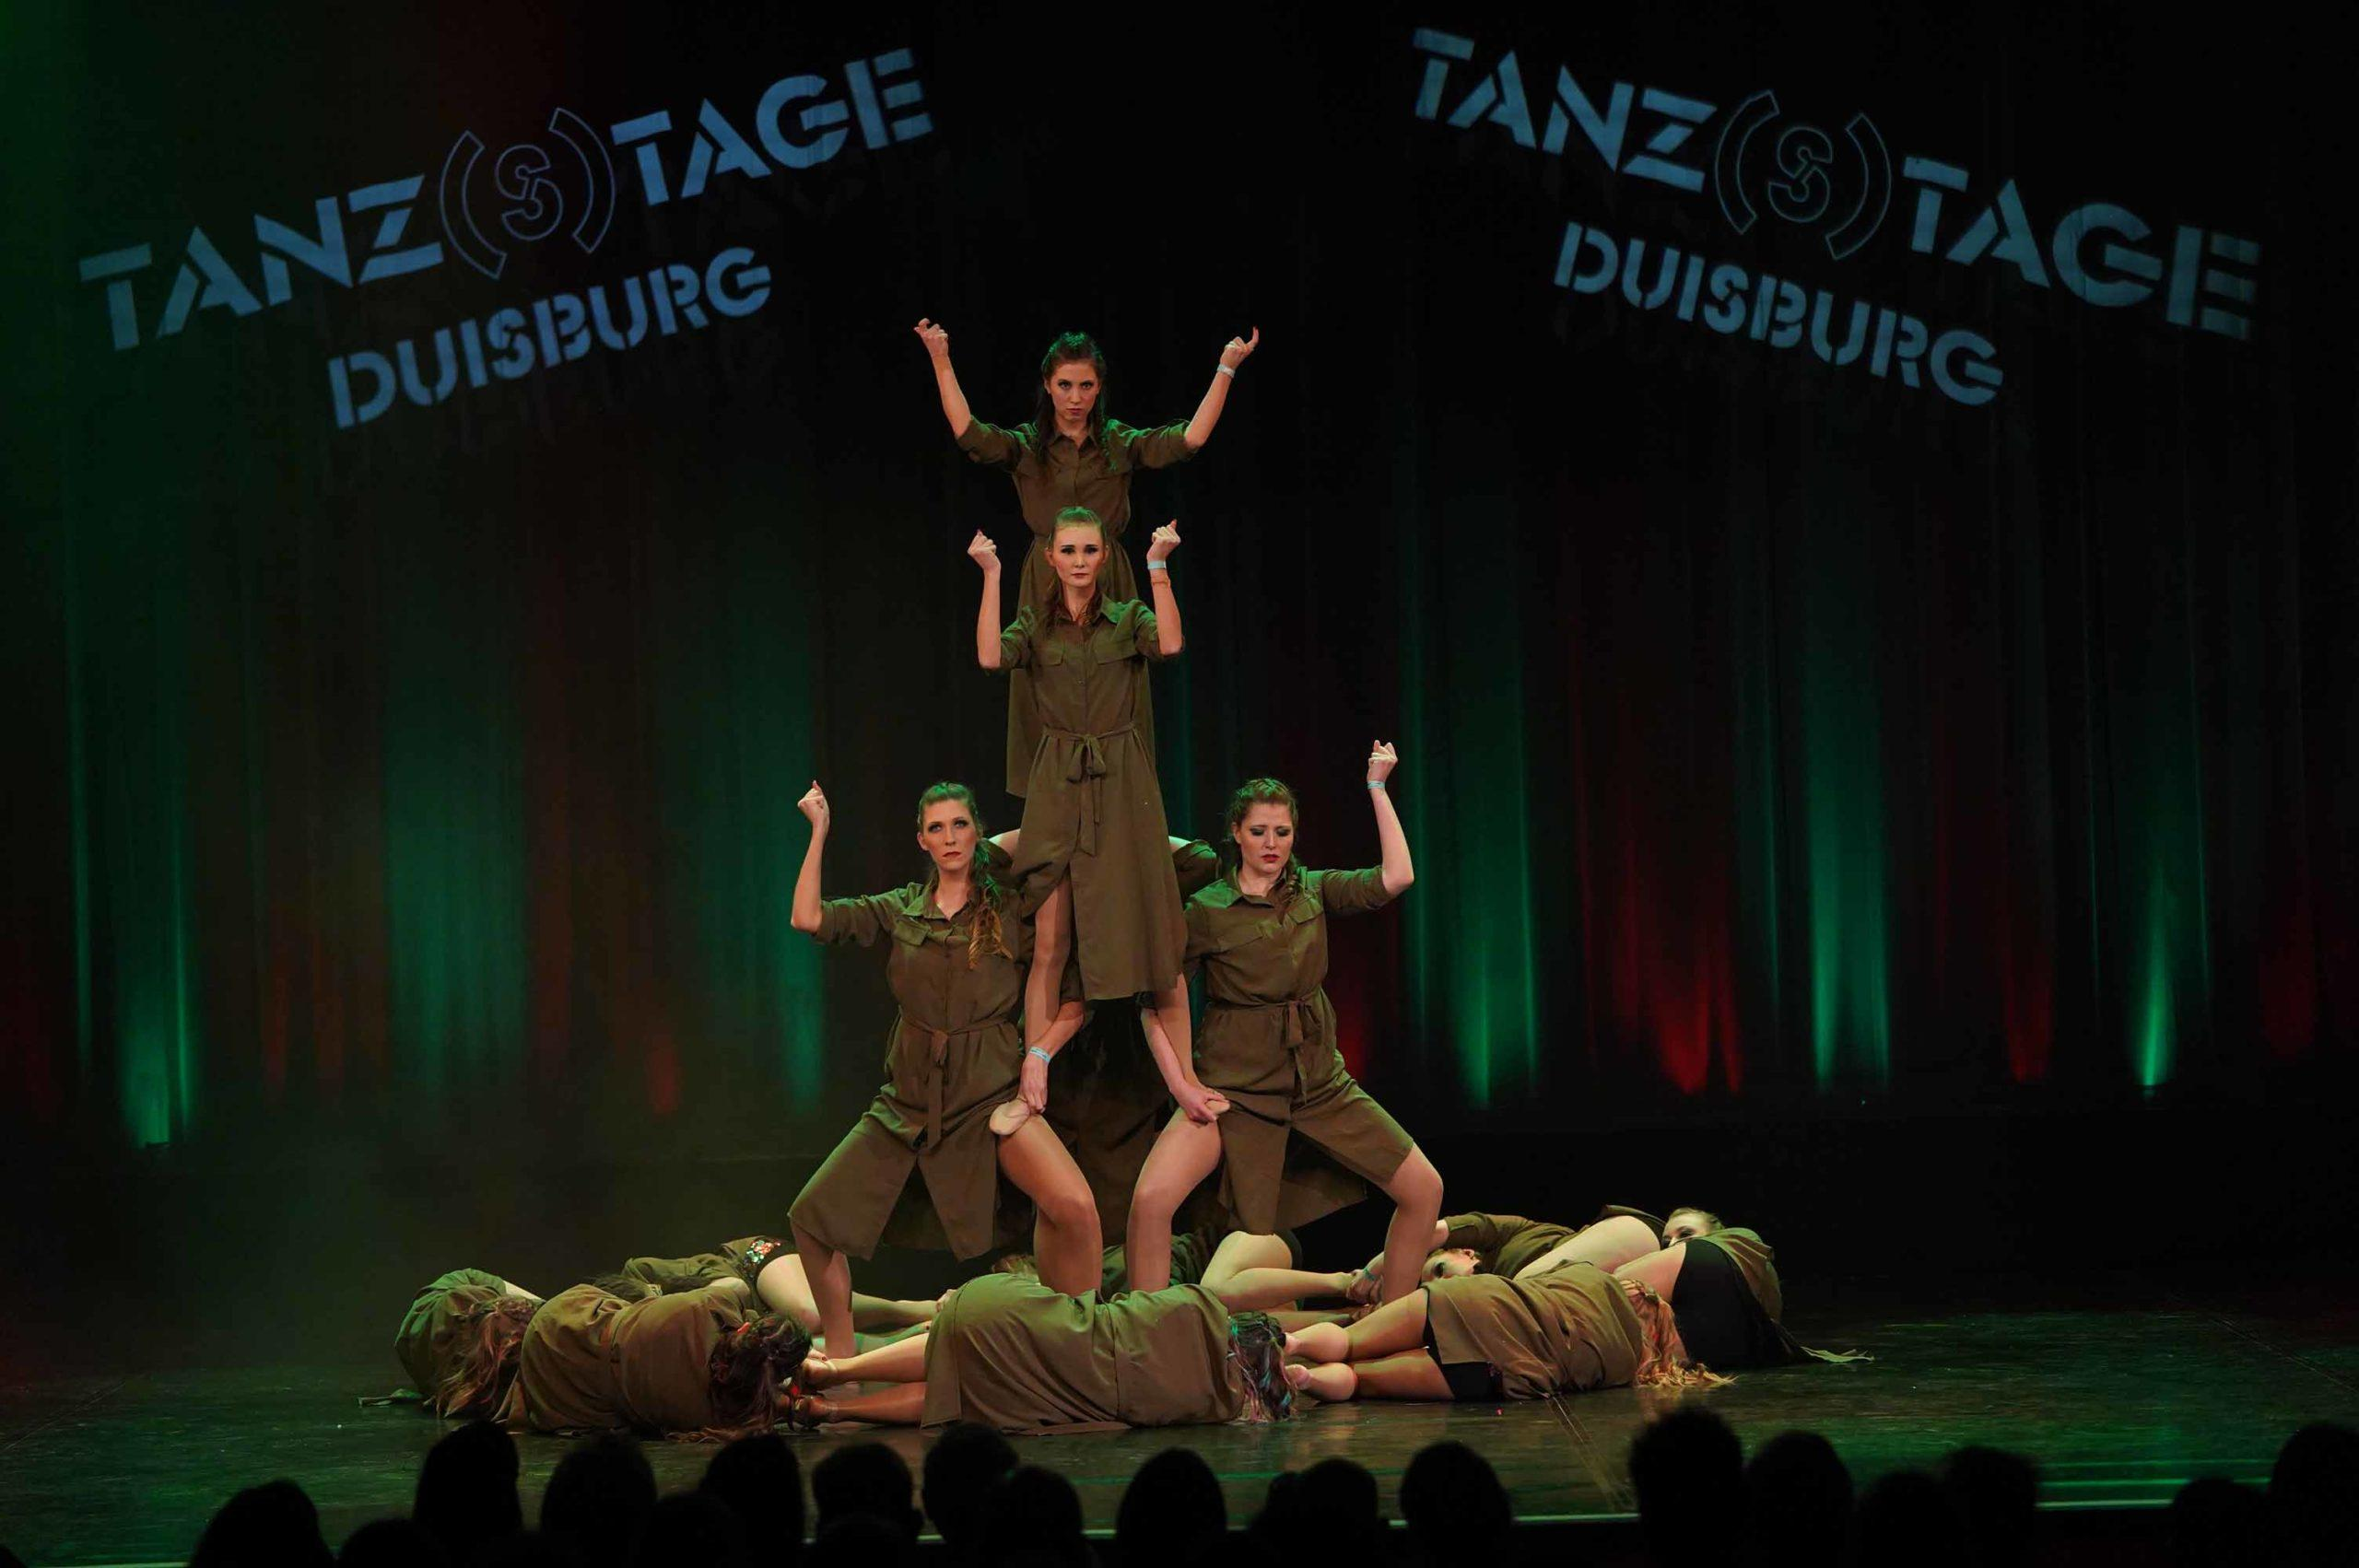 DancELICIOUS erfolgreich bei den Duisburger TANZtagen